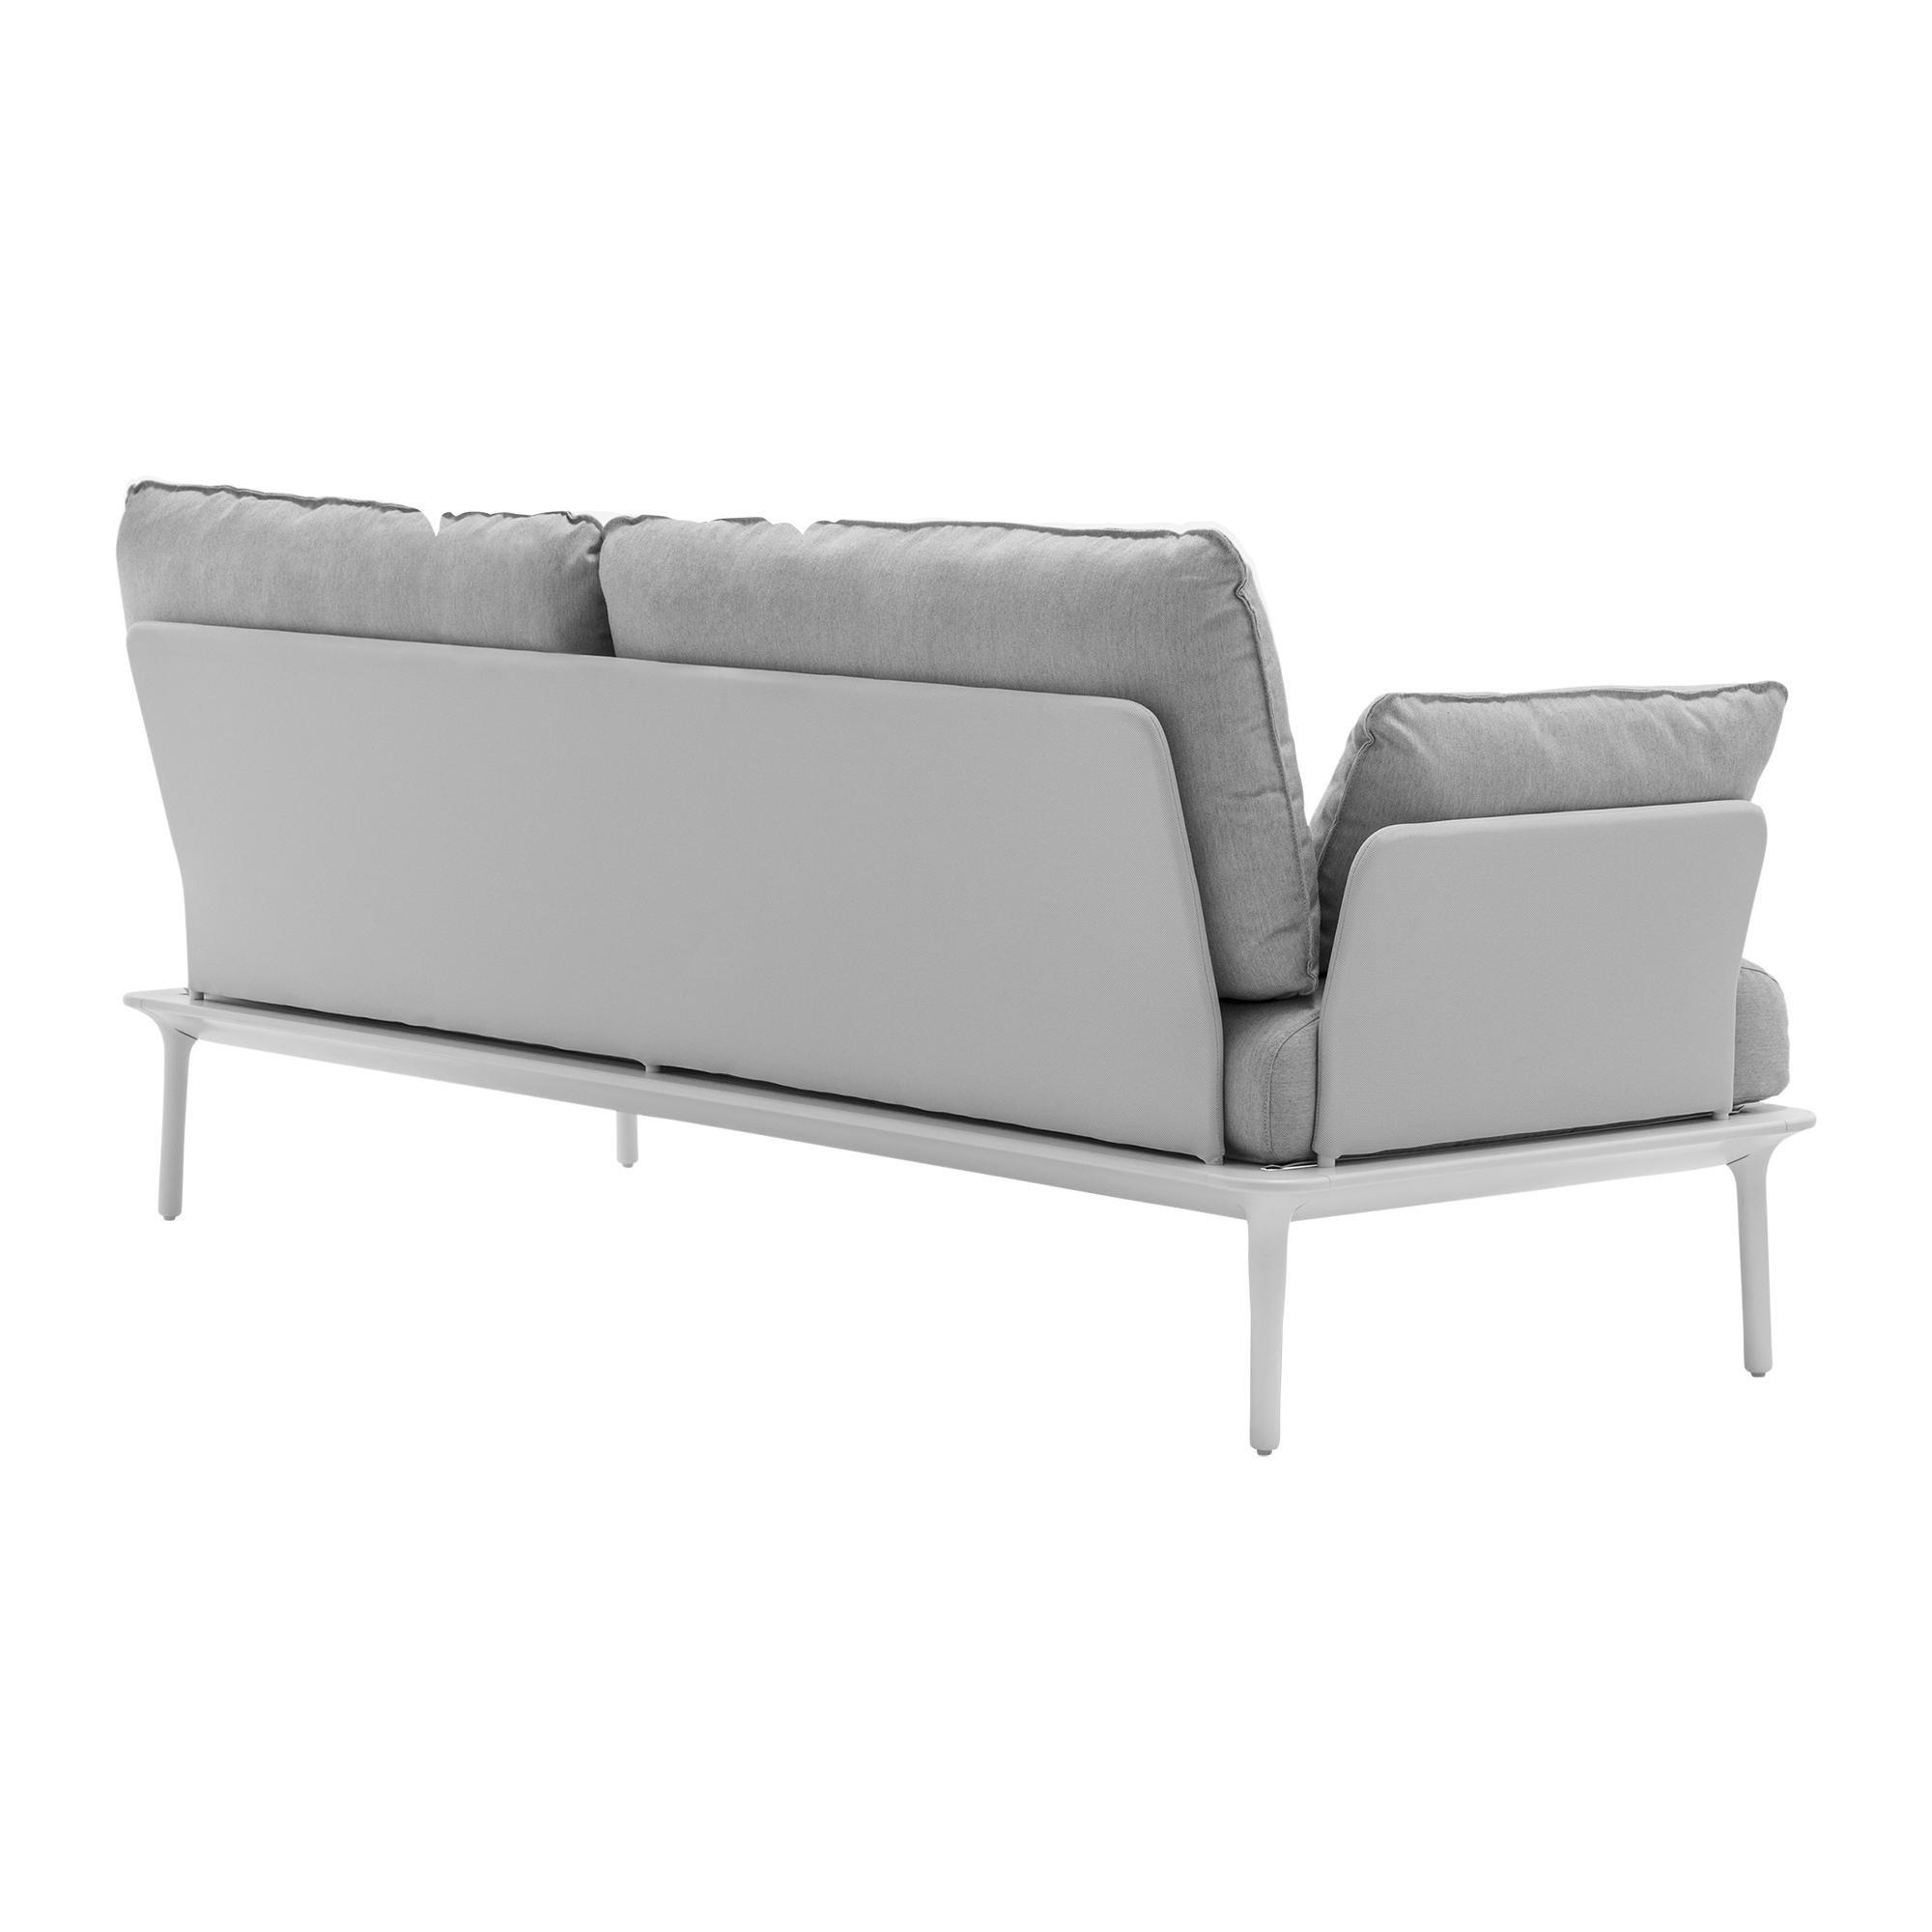 Terrific Reva Lounge Outdoor 3 Seater Sofa Squirreltailoven Fun Painted Chair Ideas Images Squirreltailovenorg